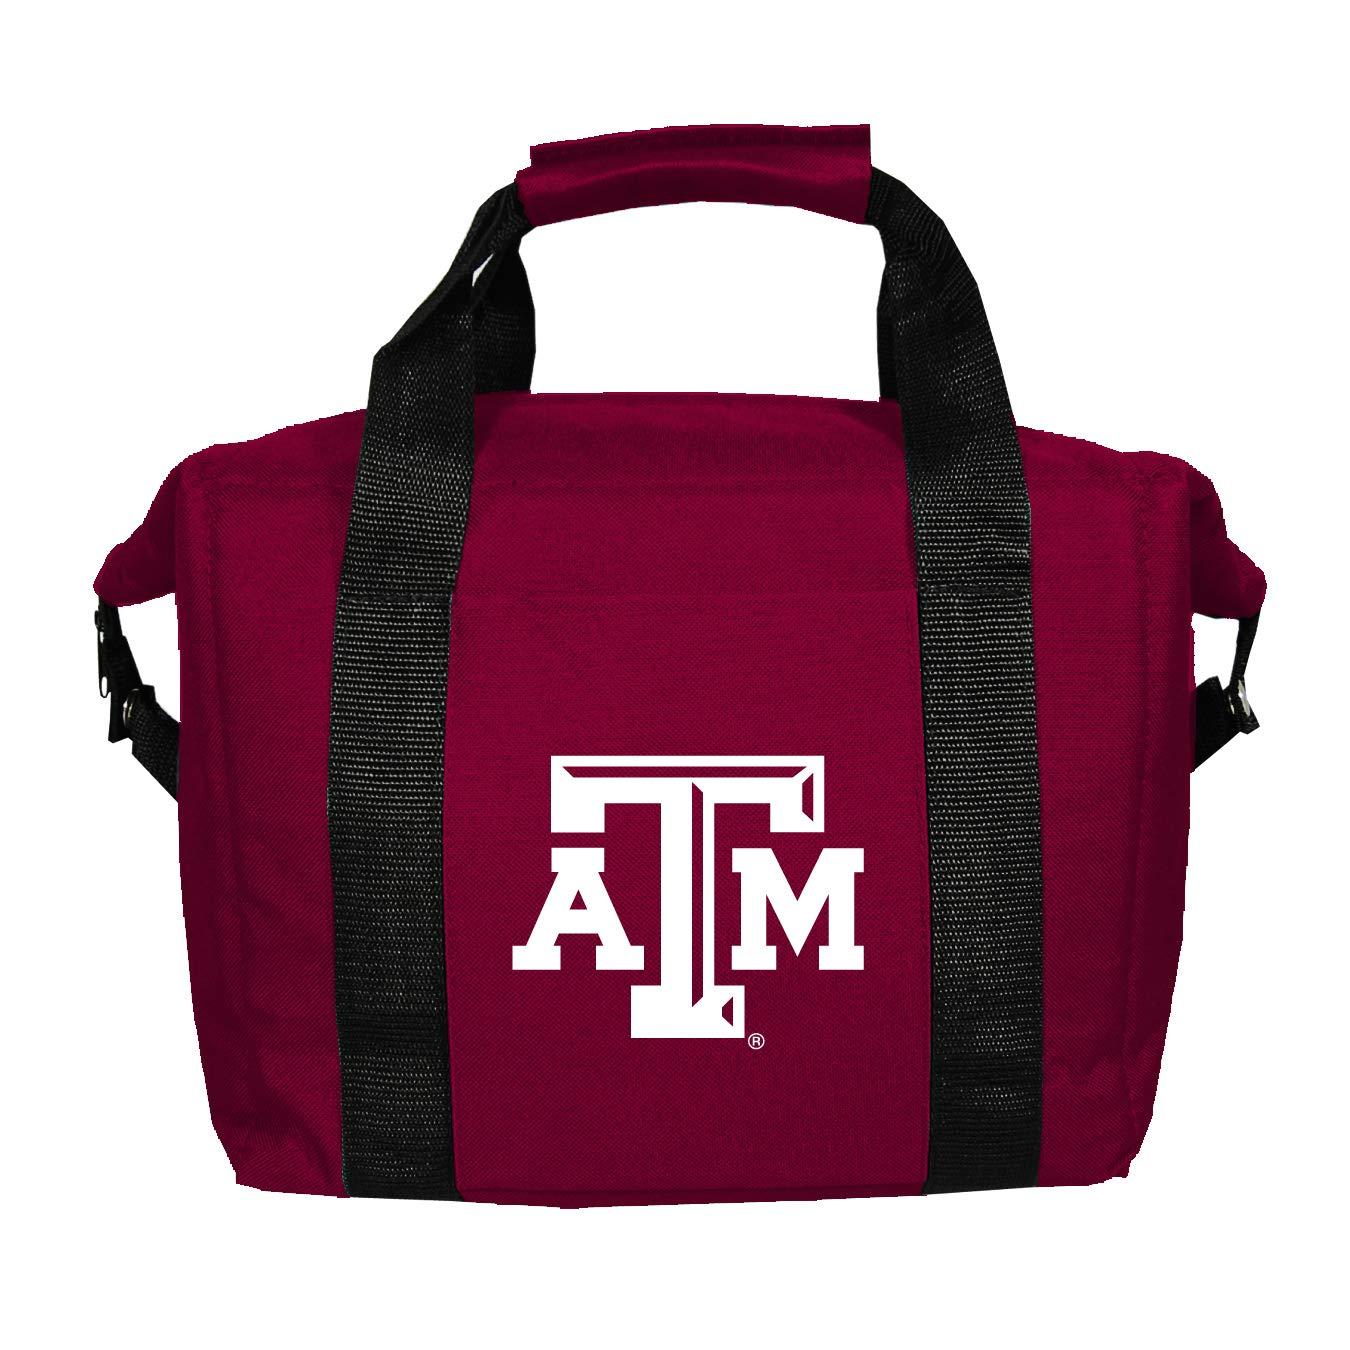 Kolder NCAA Texas A & M Aggies Weiche Seiten Baumwollmusselin Kühltasche